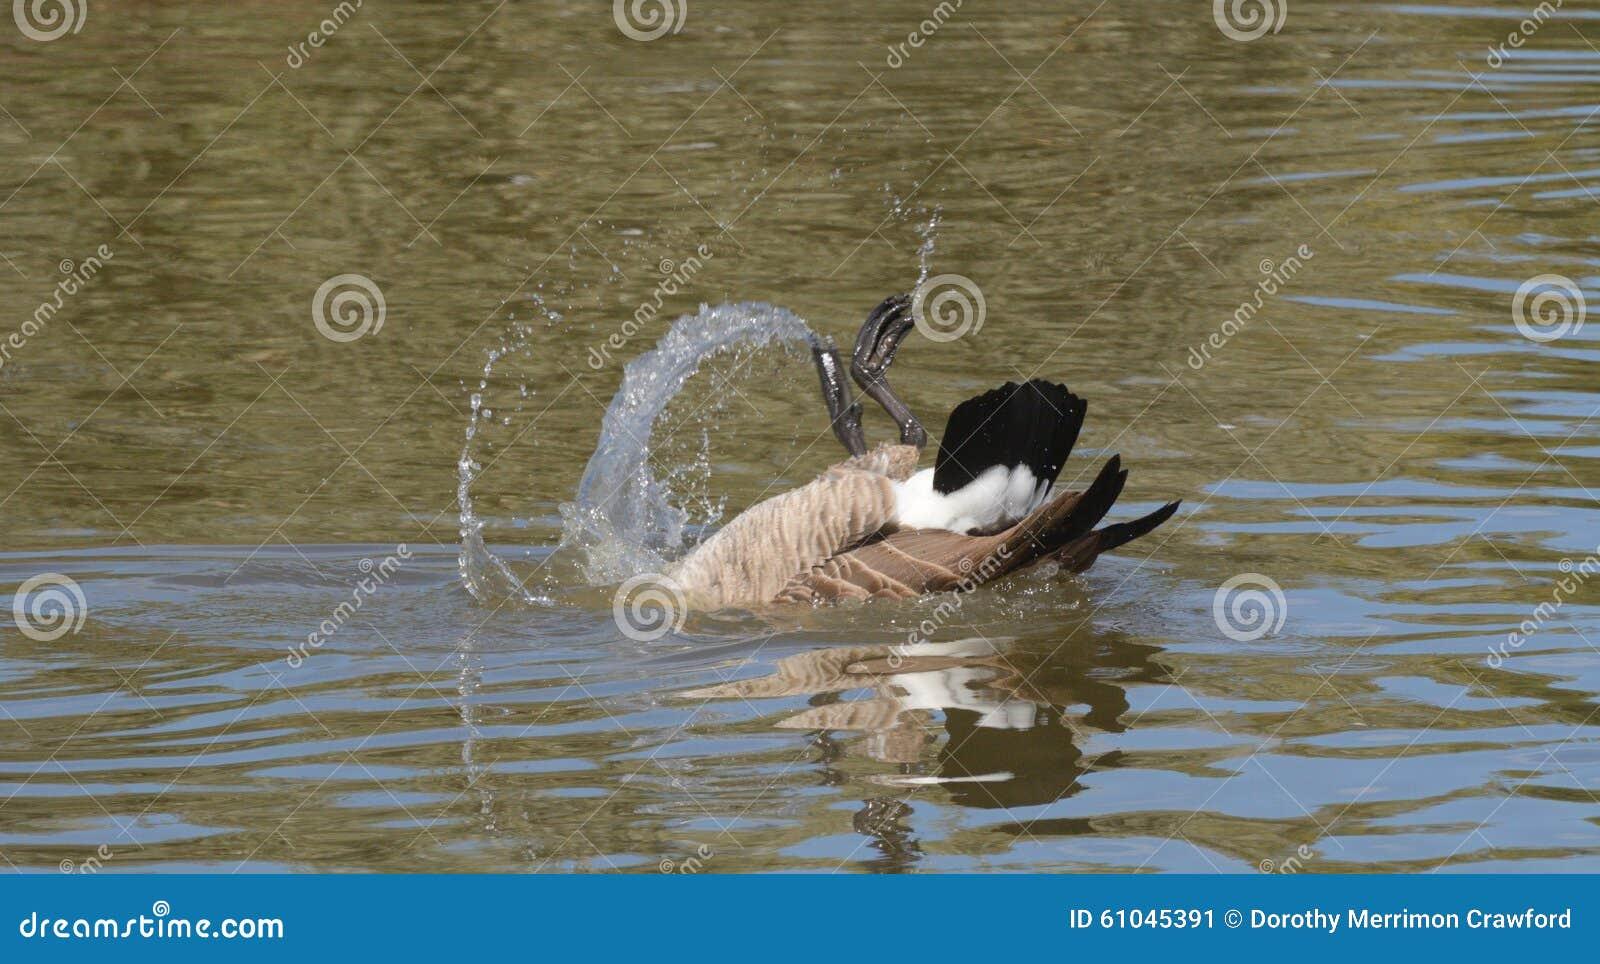 Canada Goose victoria parka online 2016 - Canada Goose Bathing Stock Photo - Image: 61045391